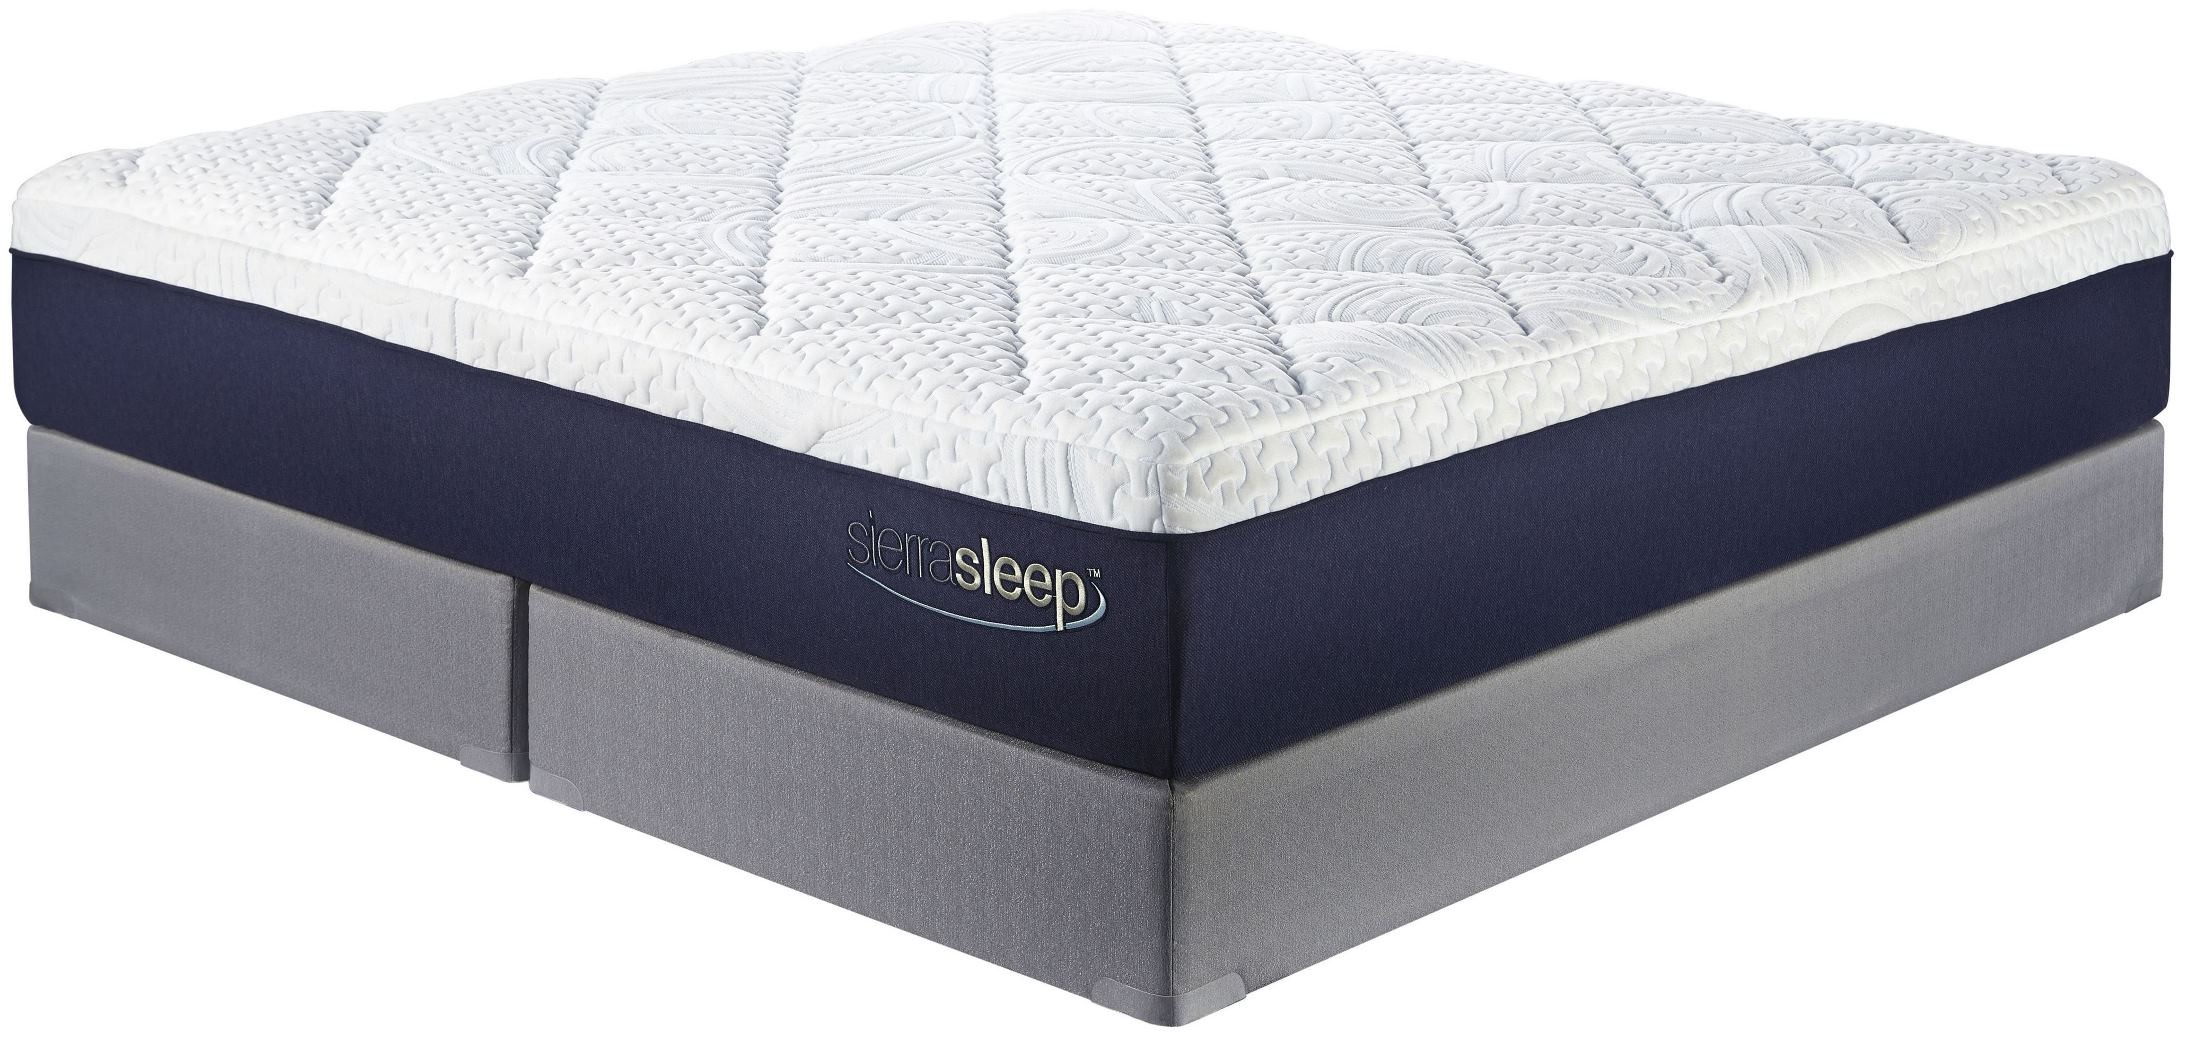 13 inch gel memory foam white cal king mattress from ashley m97451 coleman furniture. Black Bedroom Furniture Sets. Home Design Ideas